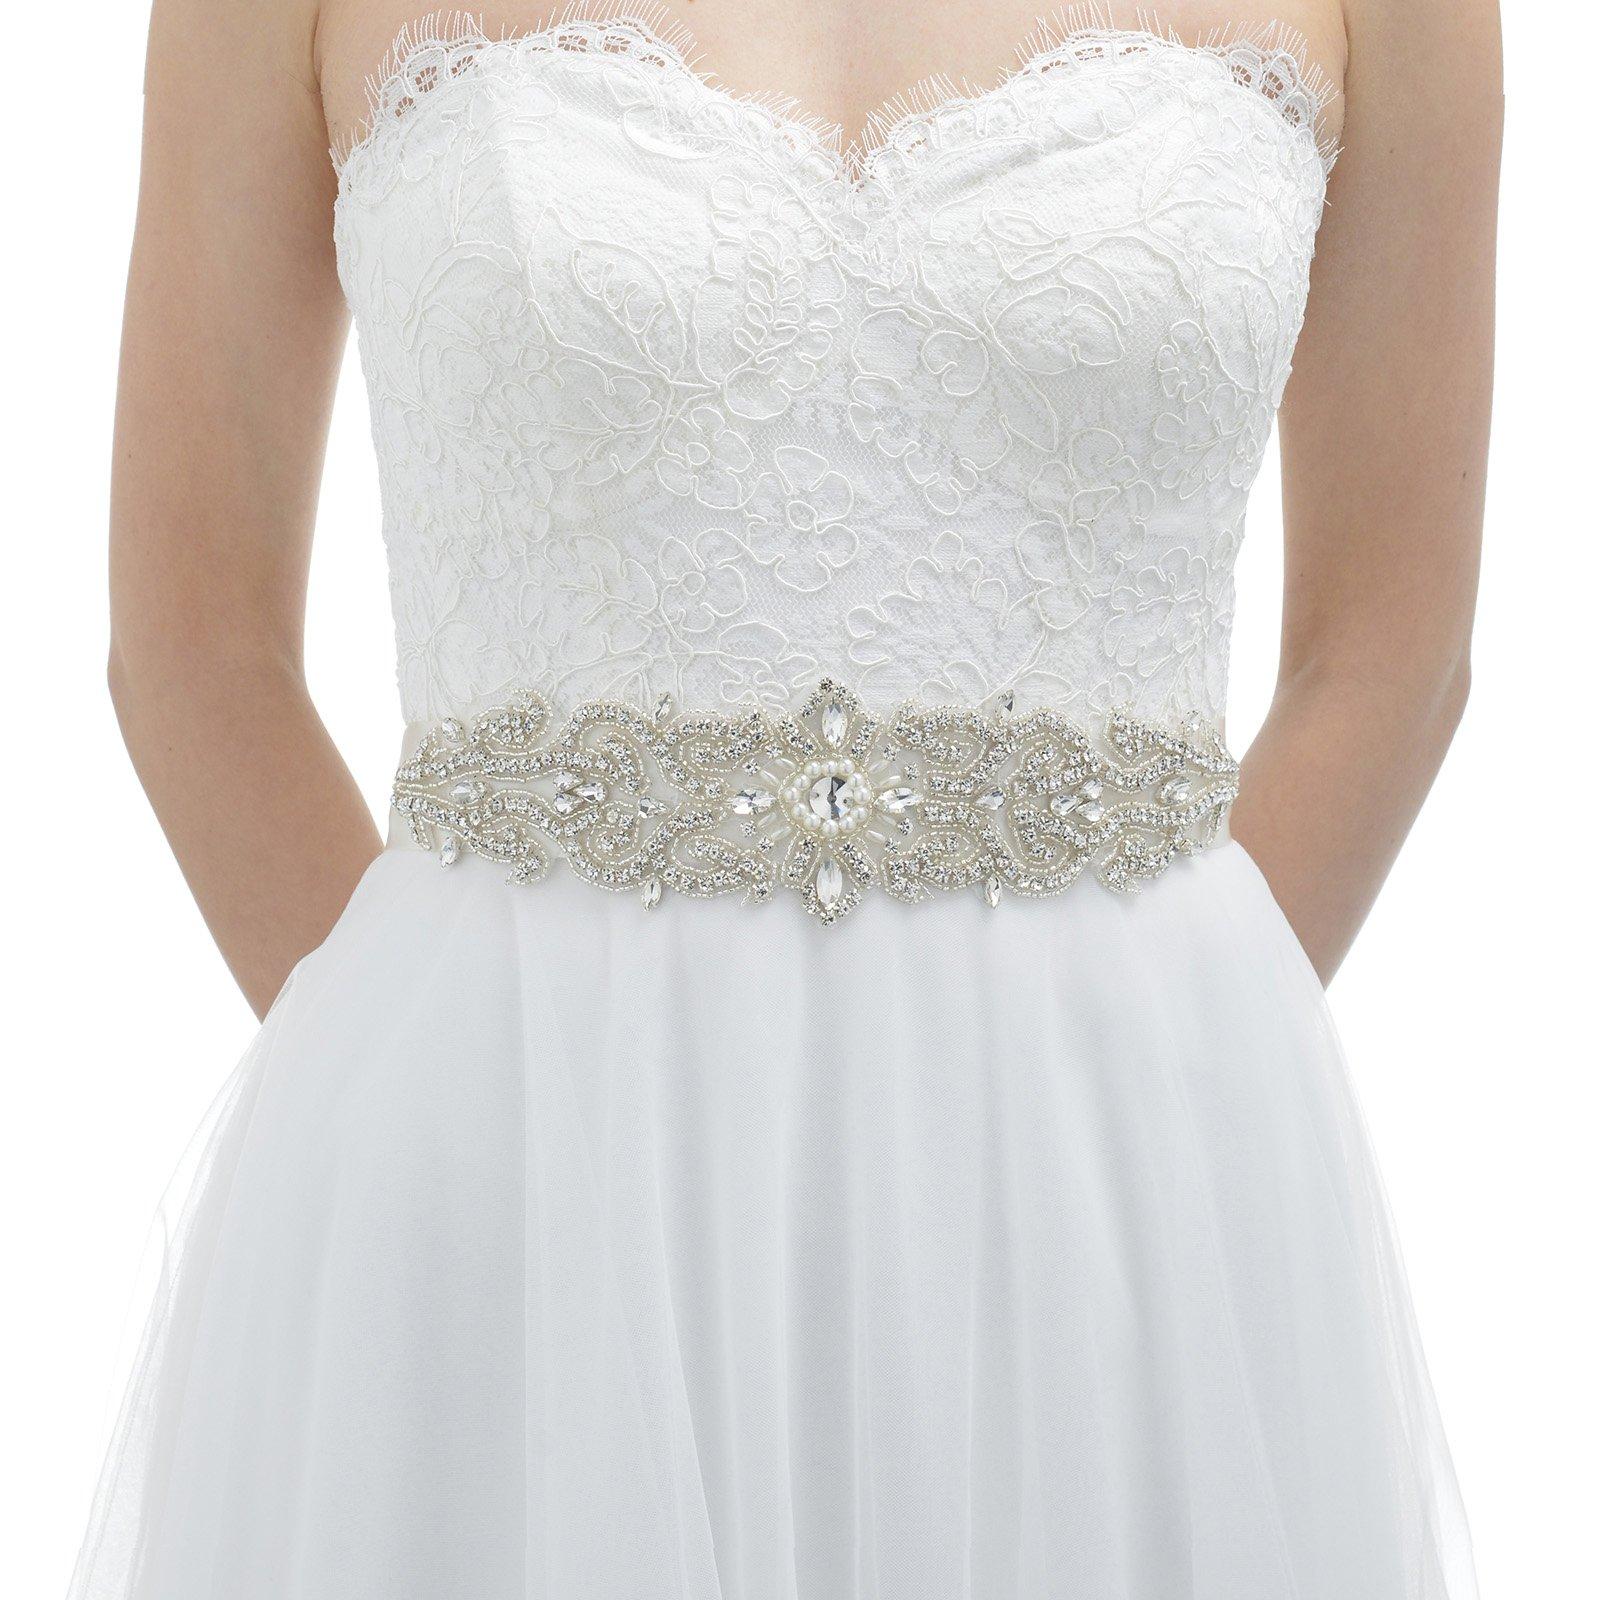 AW Wedding Belt Bridal Sash - Crystal Belt for Wedding Dress - Silver Women Belt for Prom Party Dress